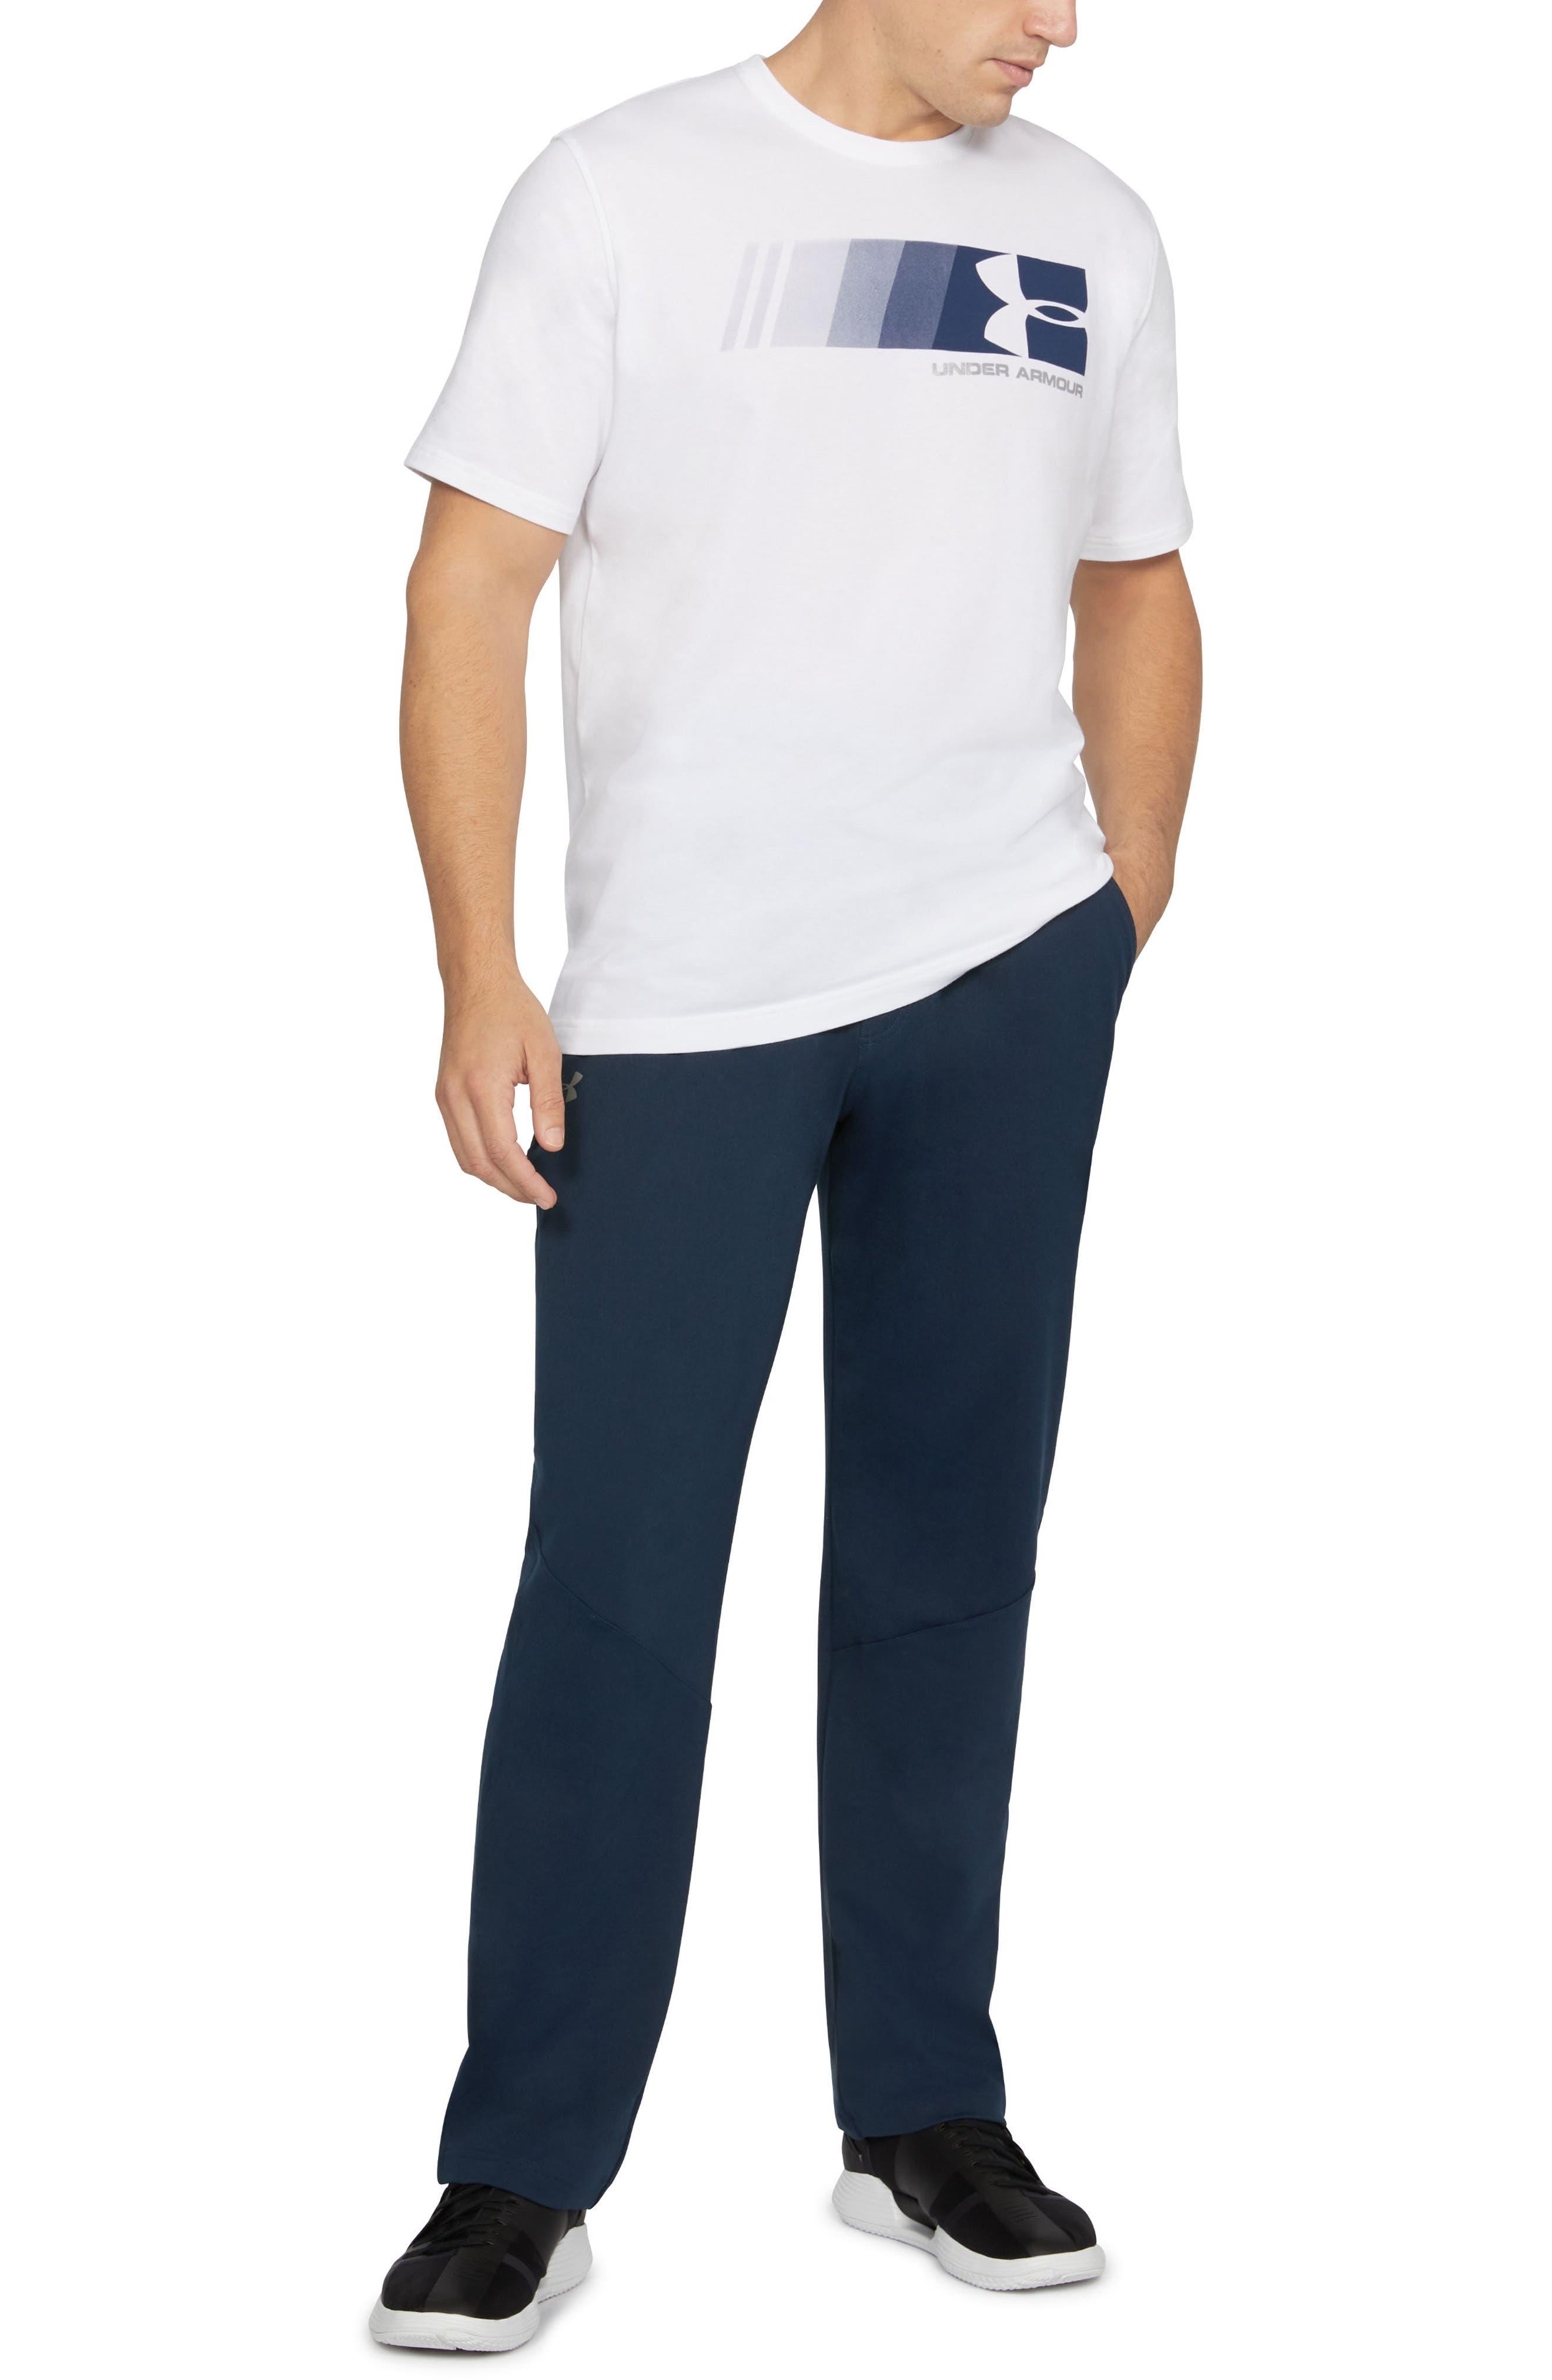 UNDER ARMOUR Regular Fit Knit Training Pants, Main, color, 408